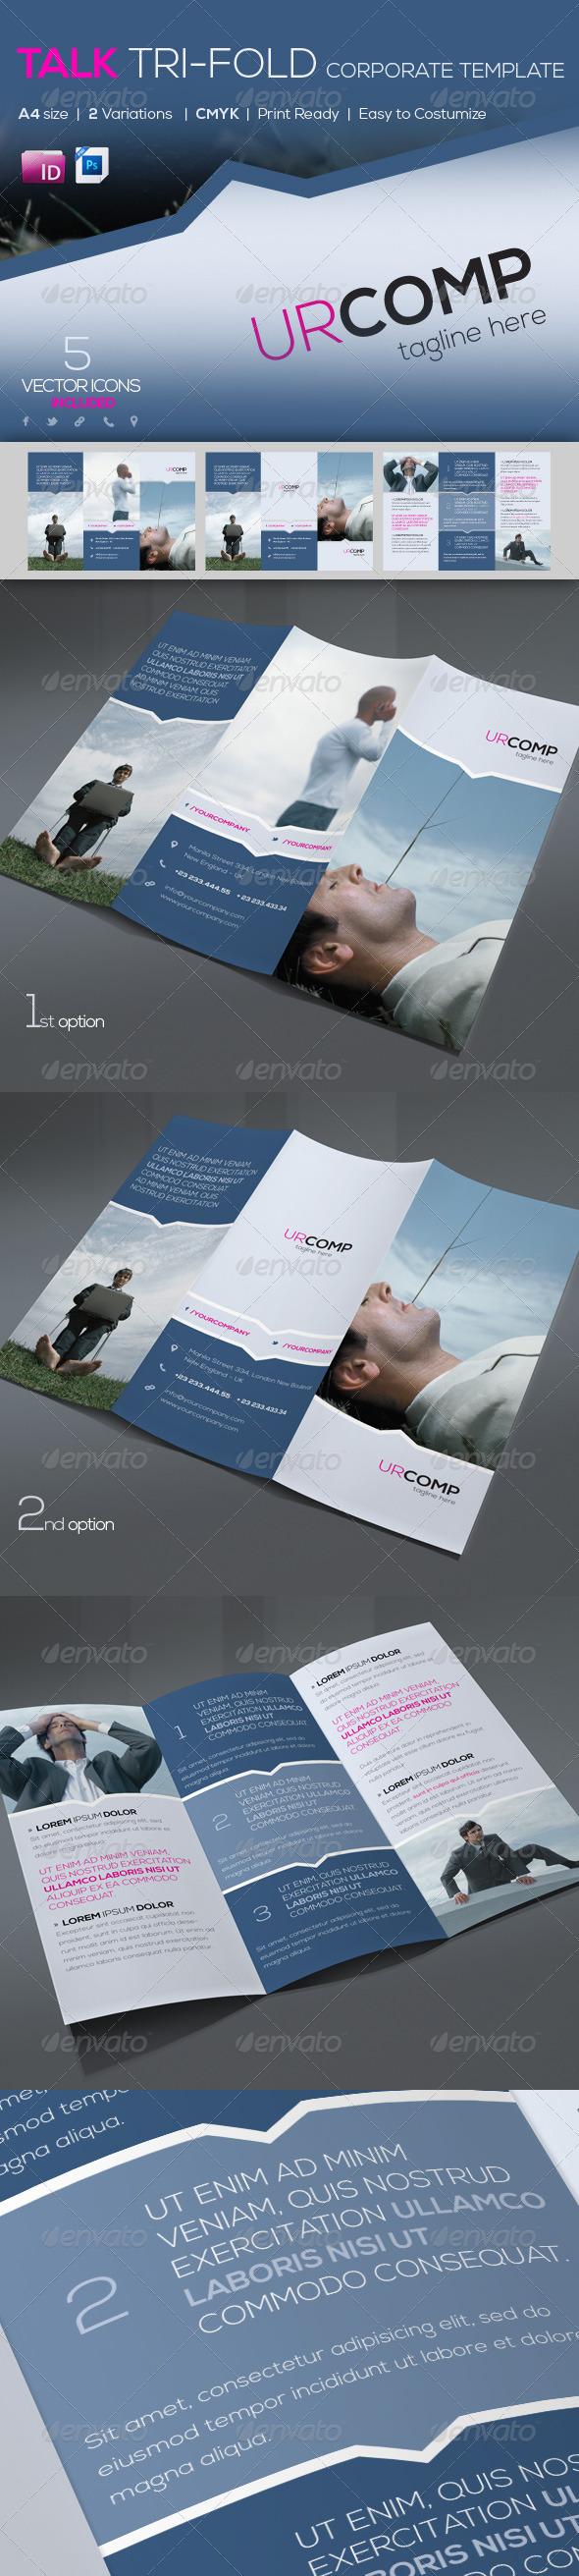 Talk Corporate Trifold Template | A4 - Corporate Brochures